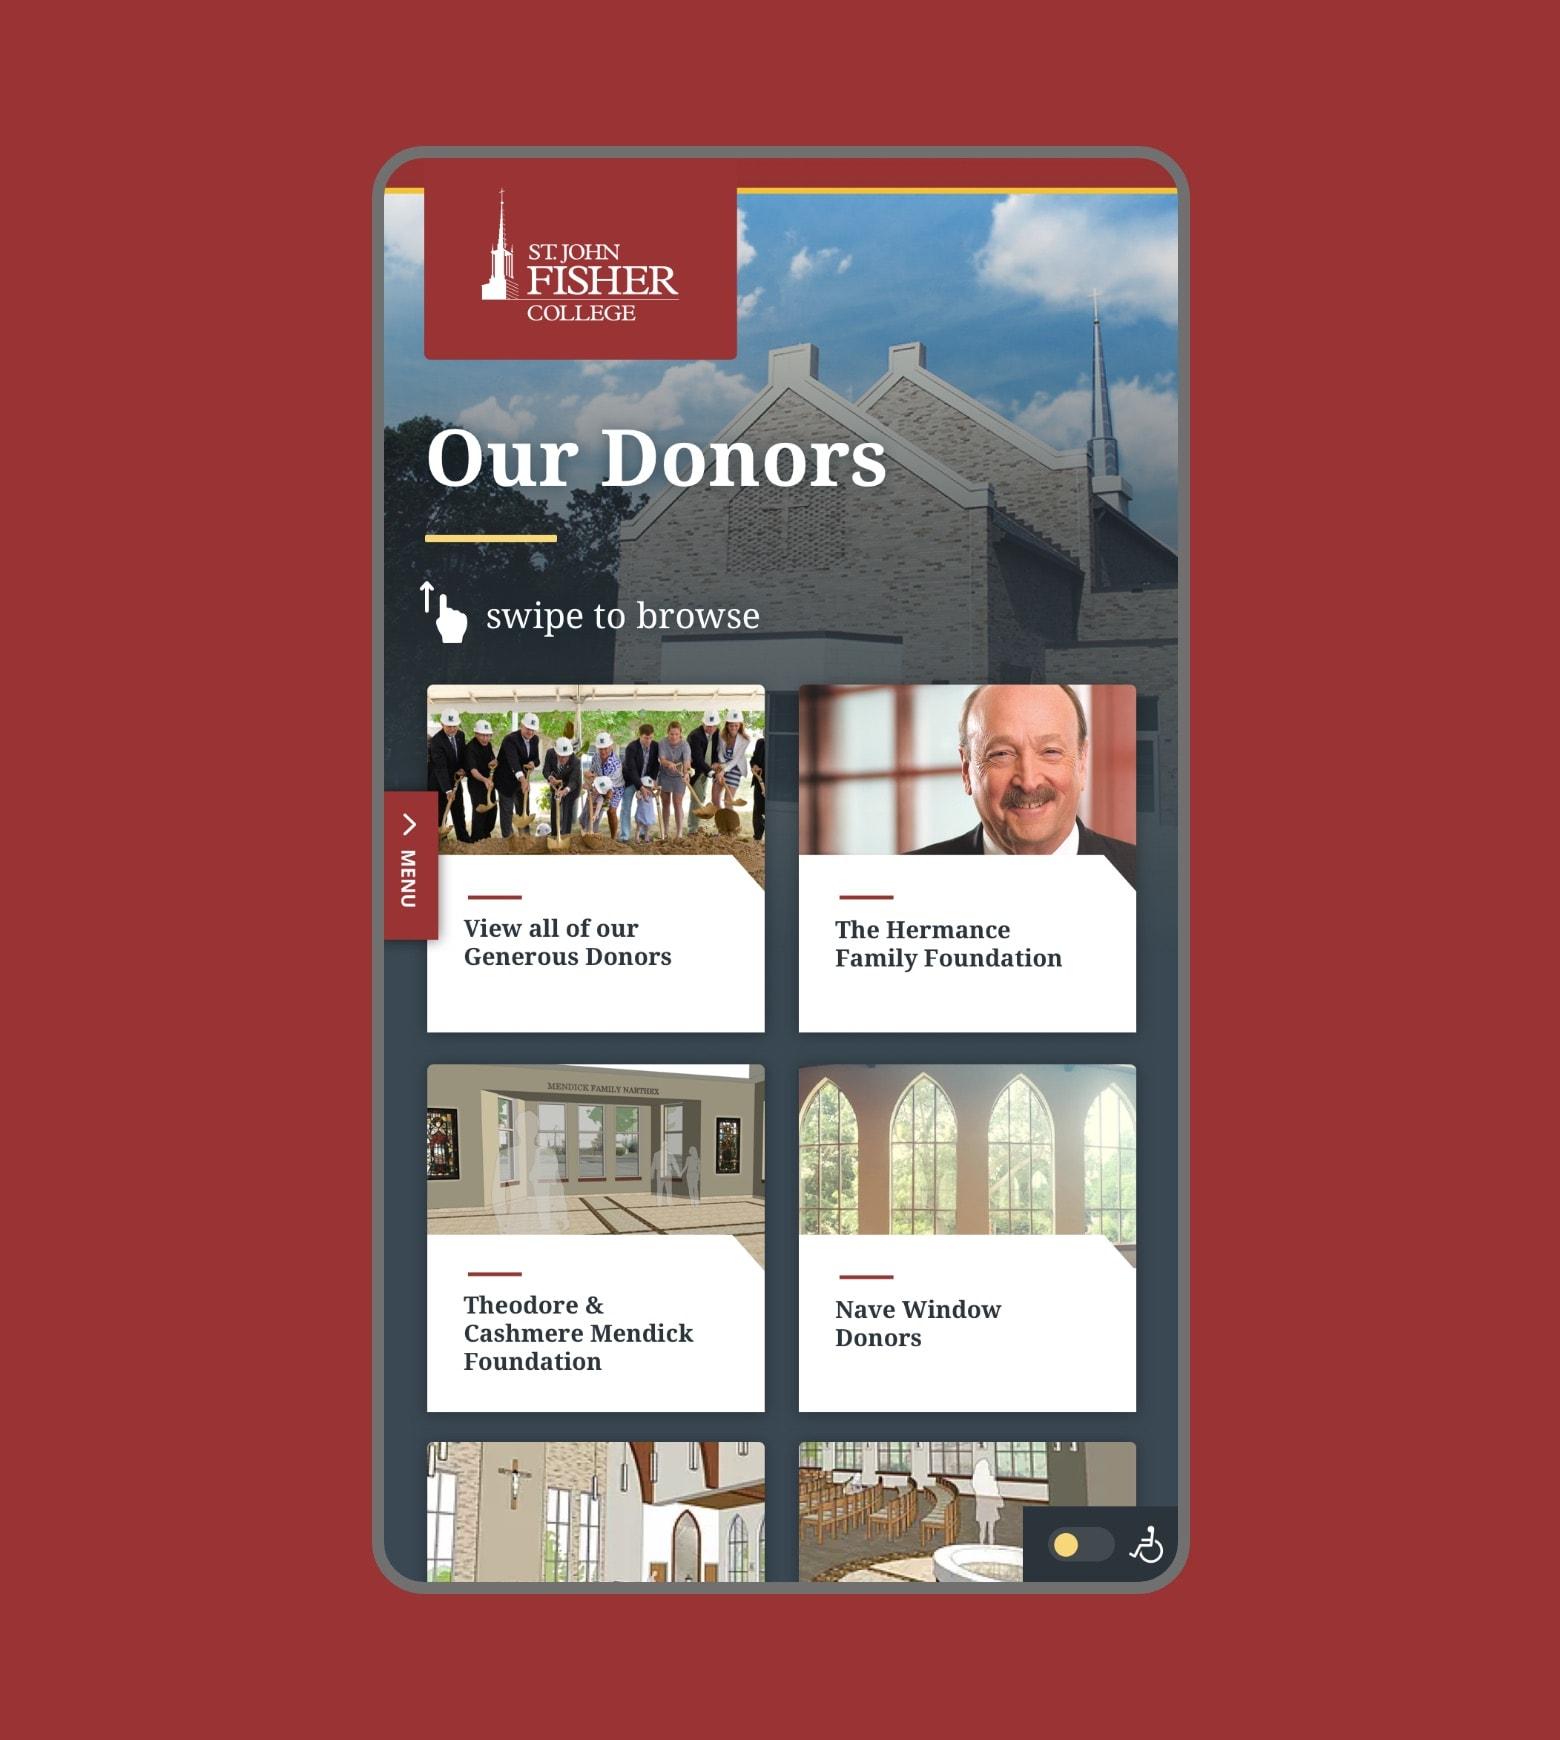 project St. John Fisher